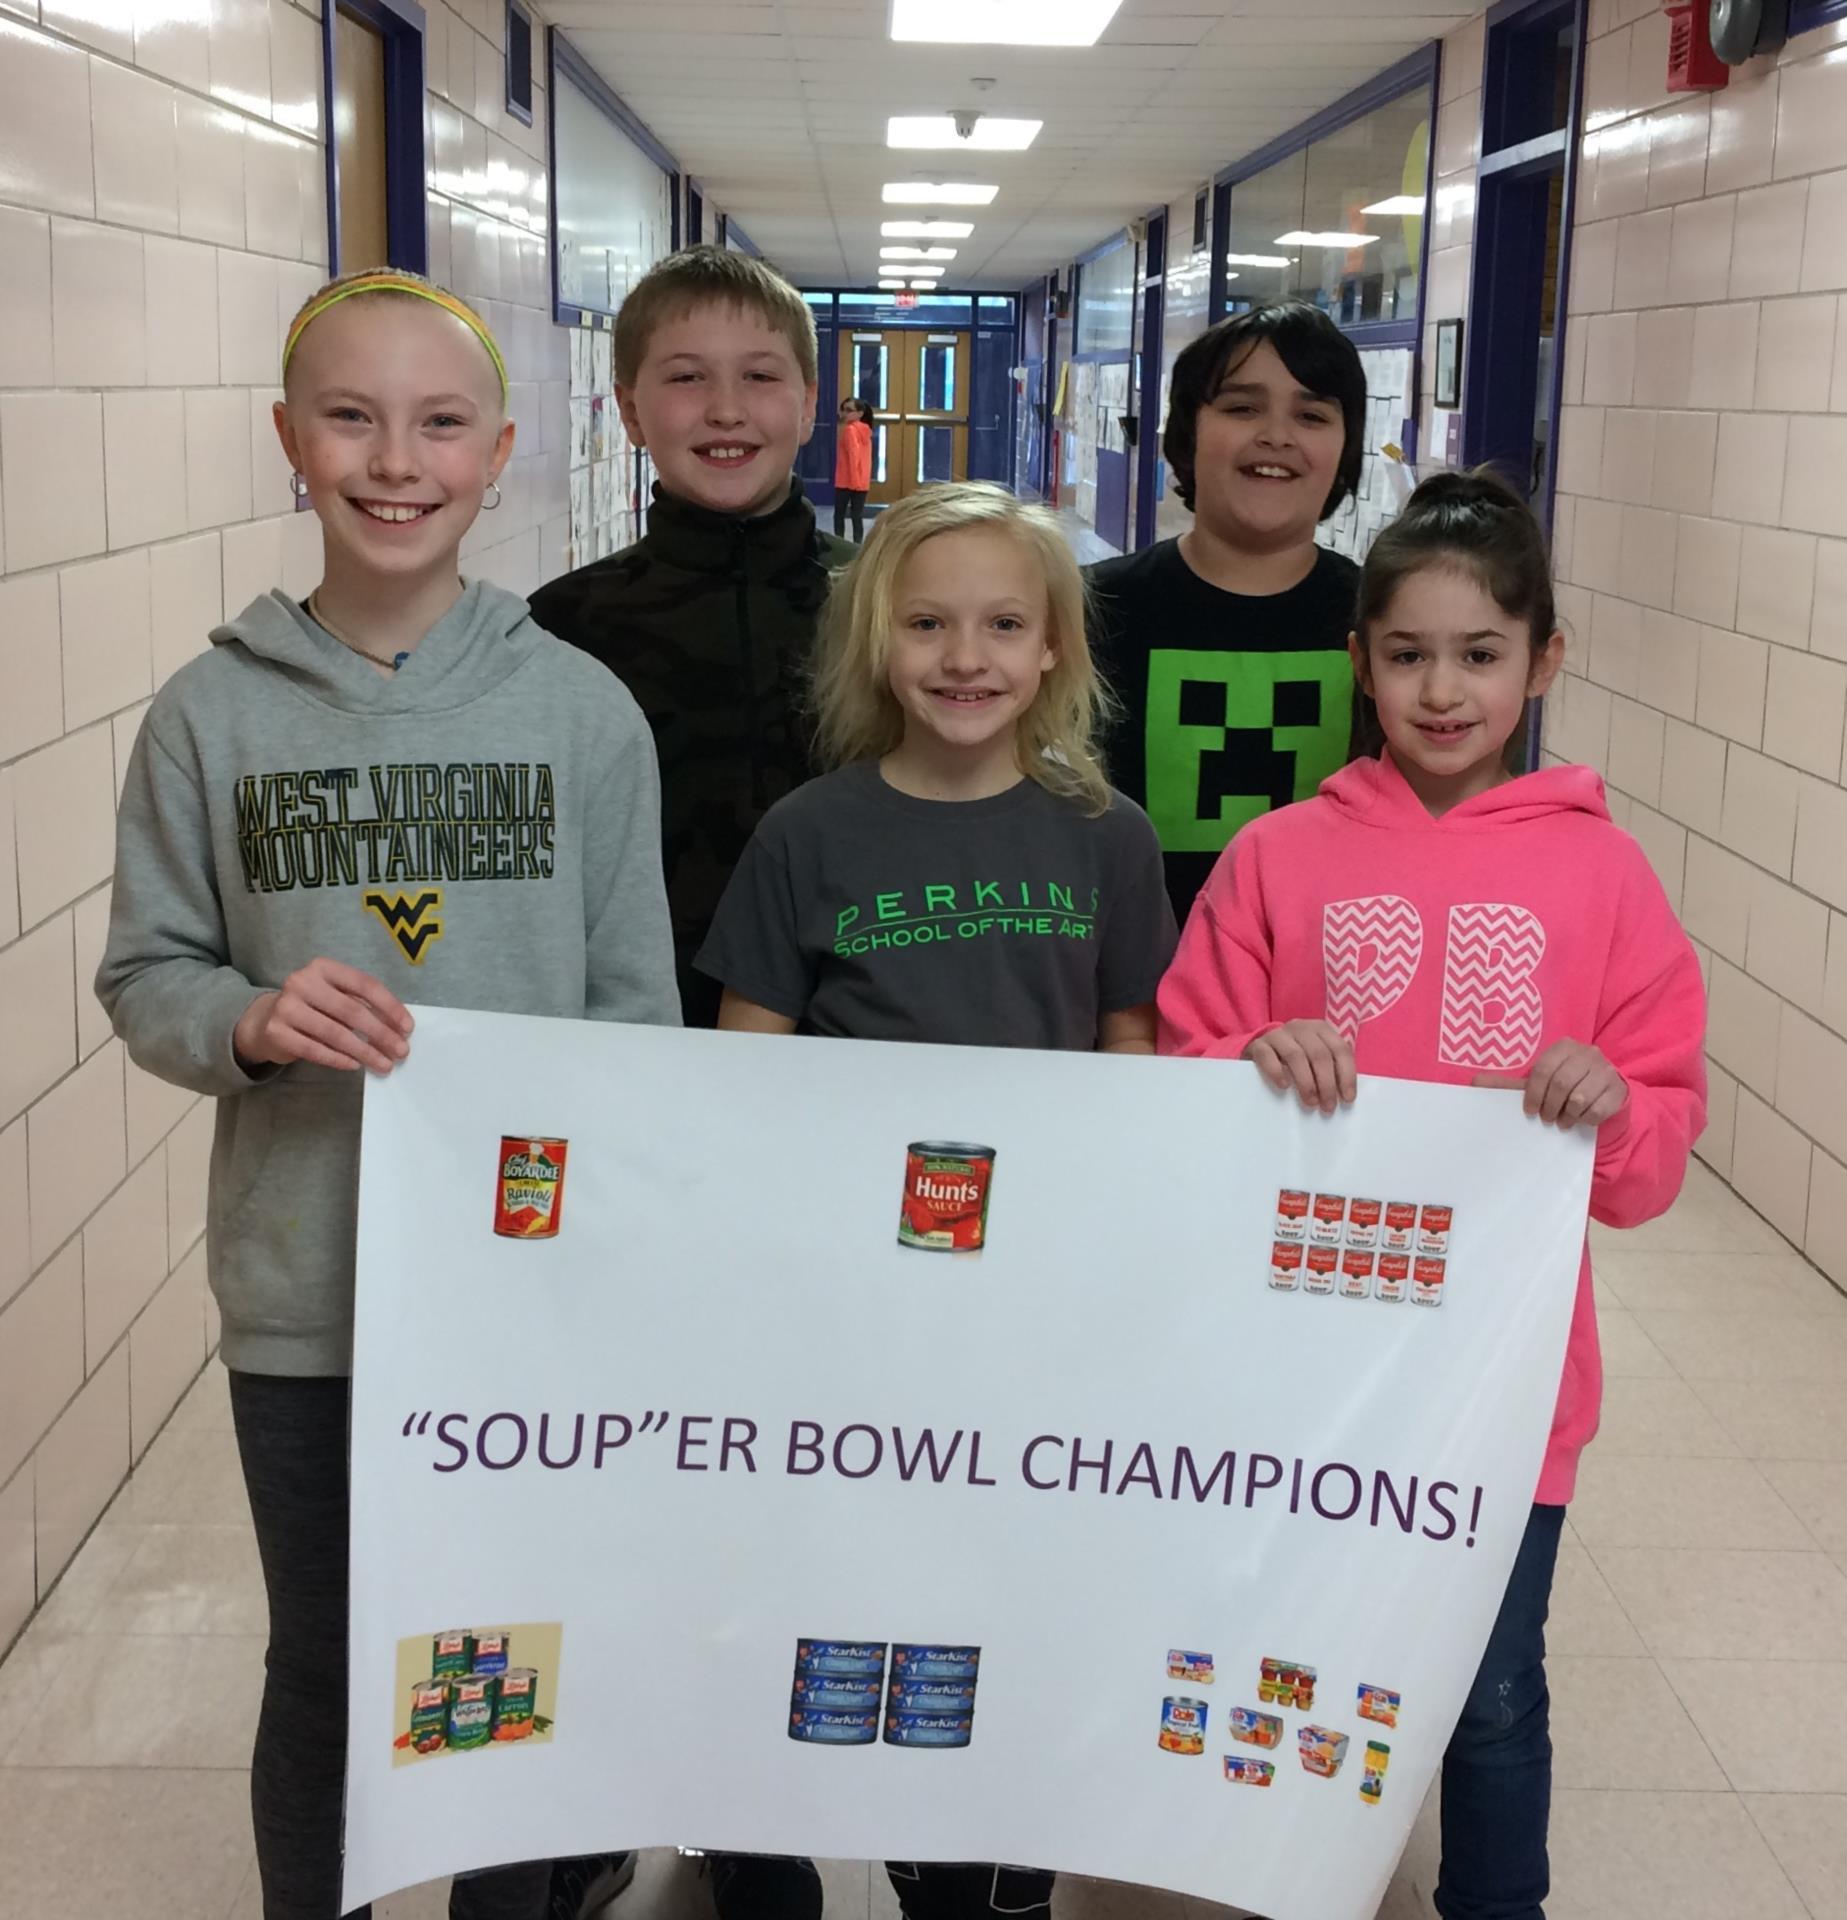 PB Souper Bowl Champions